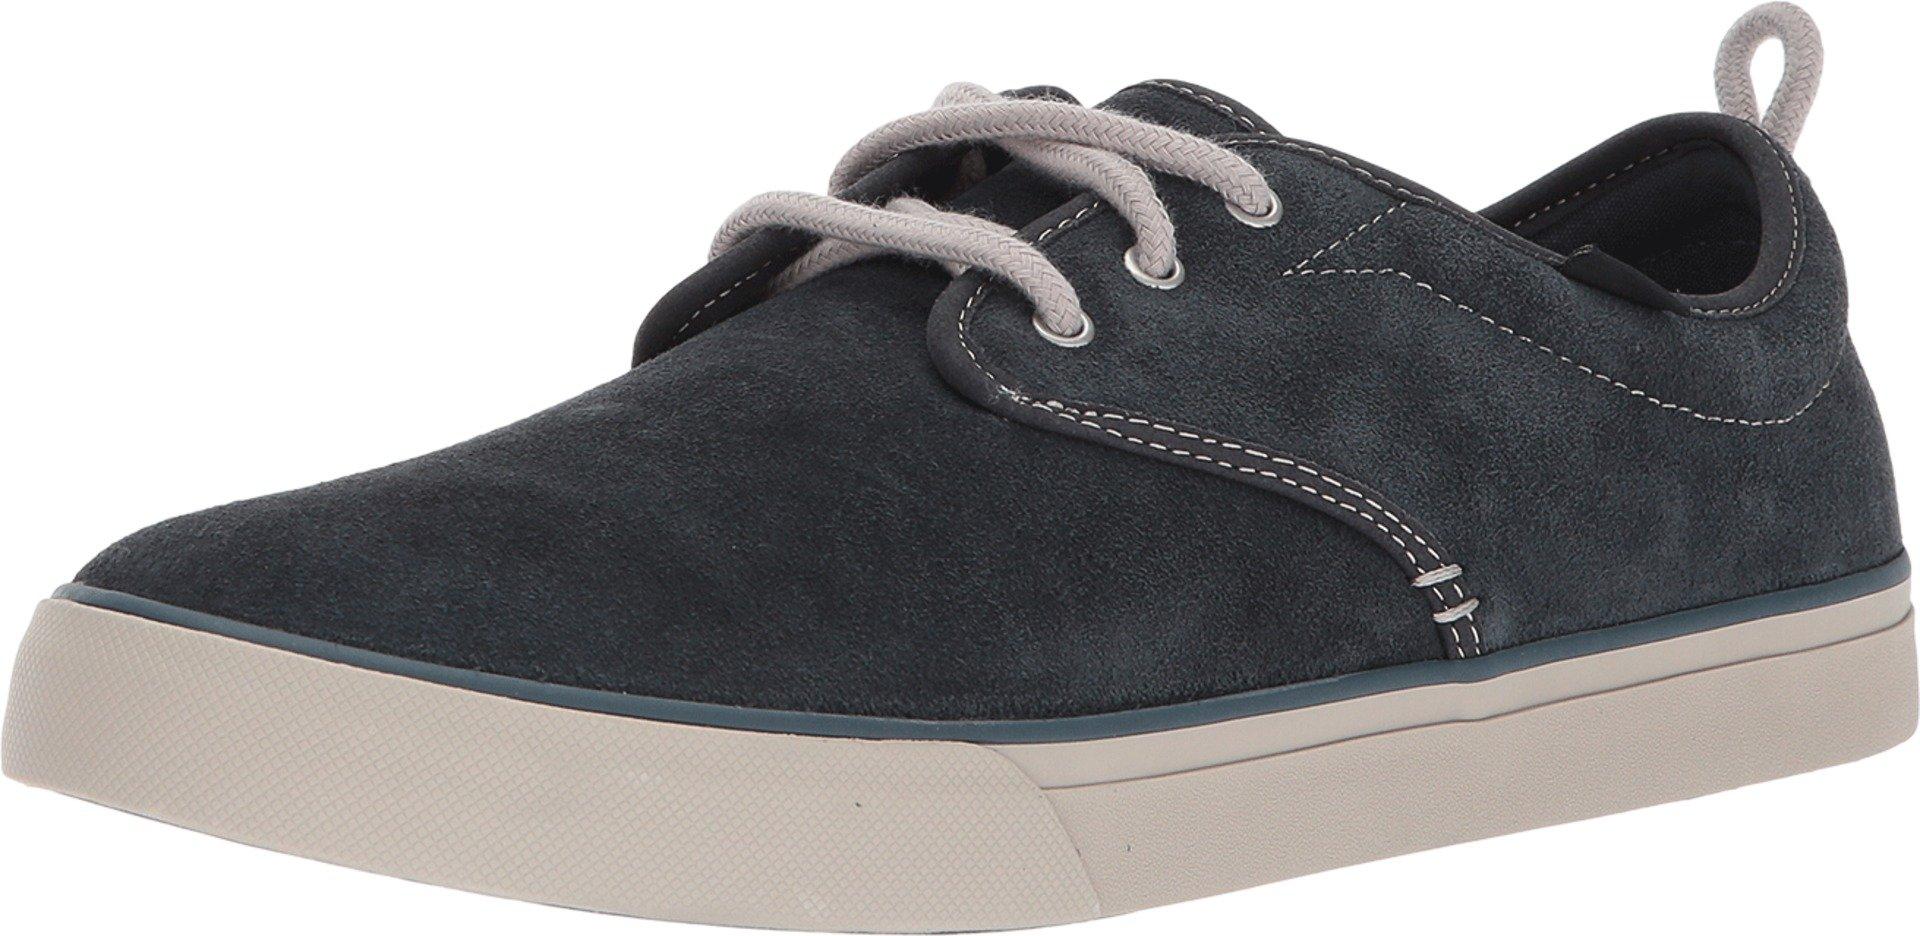 Sanuk Men's Guide Plus Suede Shoe Dark Charcoal 9.5